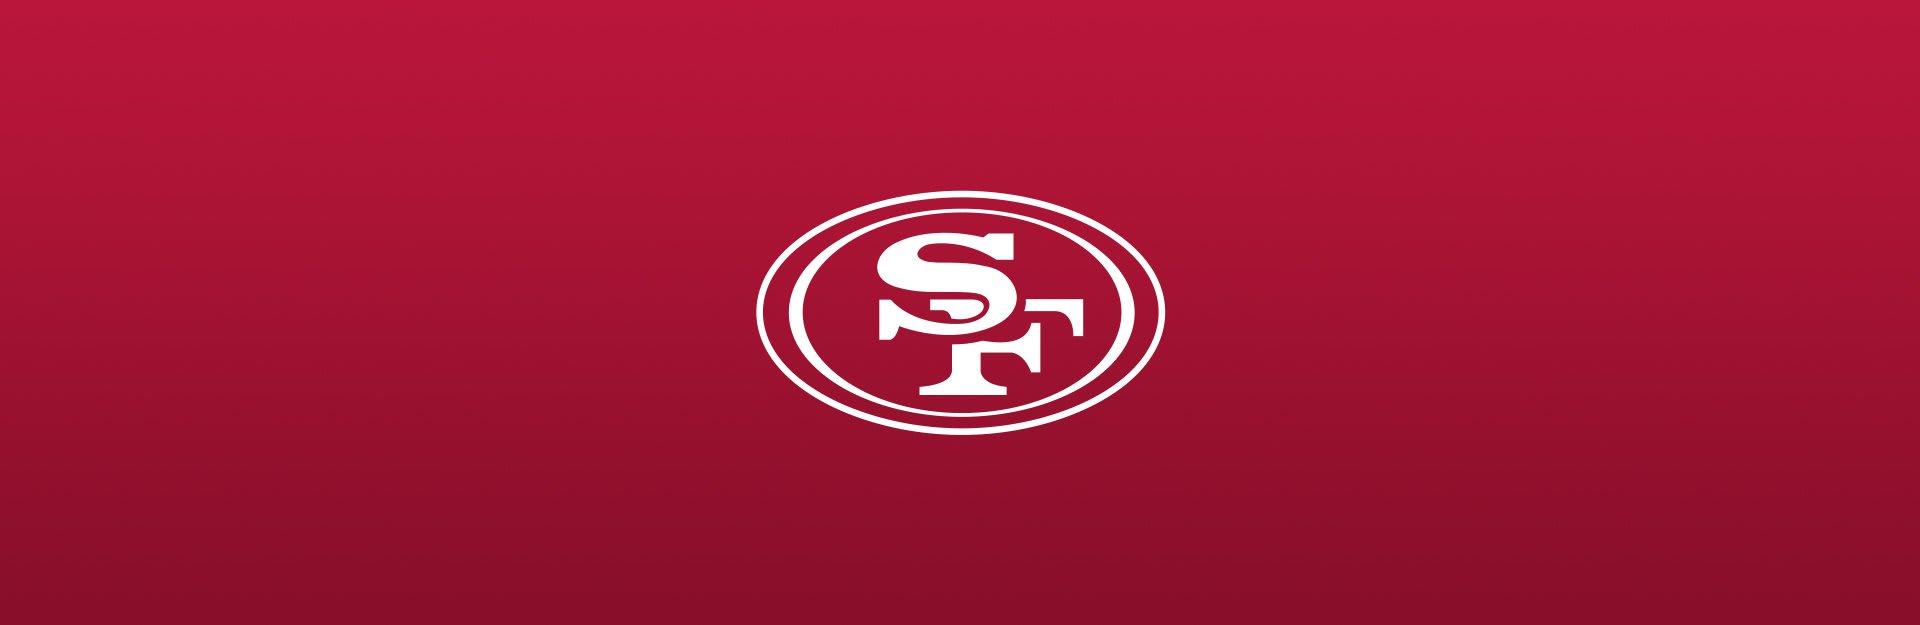 San Francisco 49ers, logo overlaid on red background